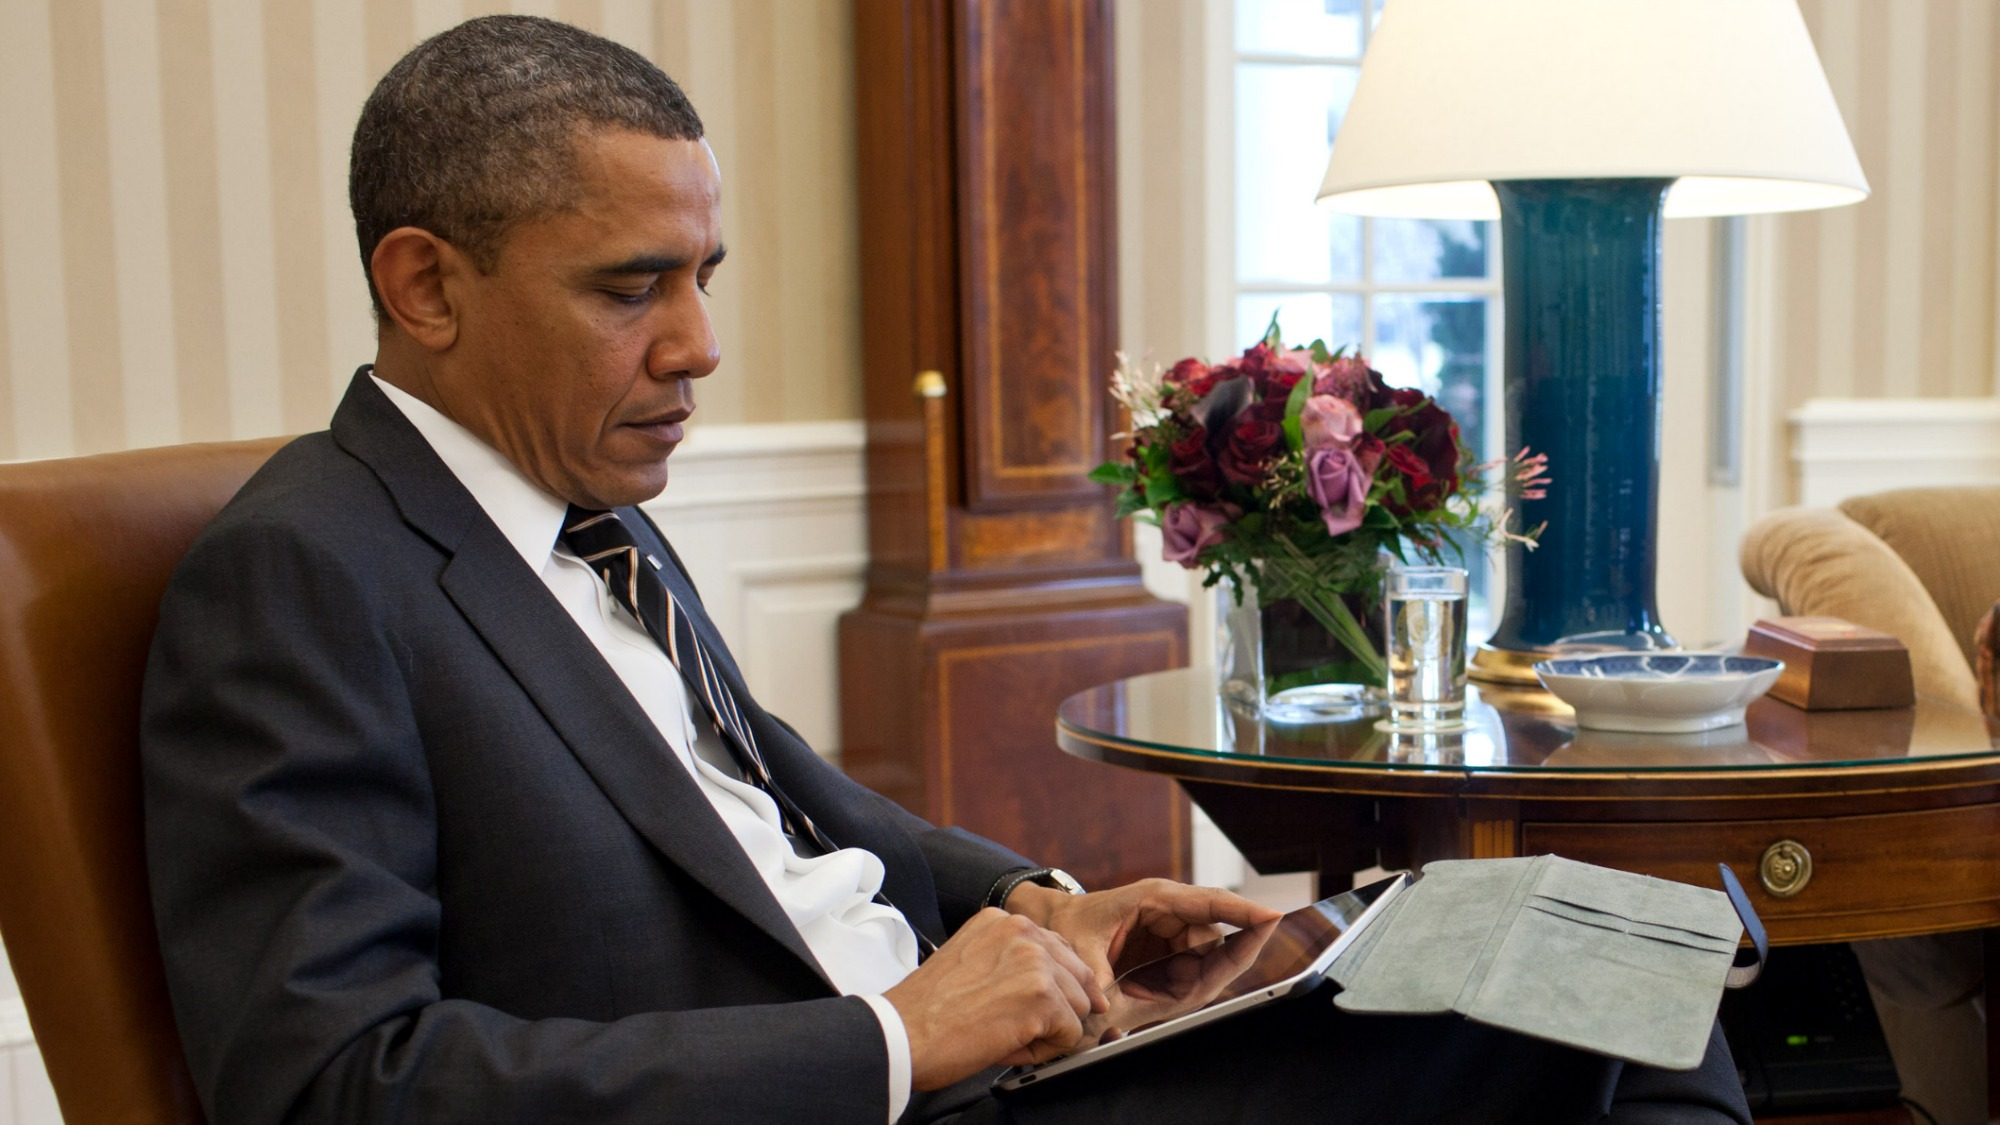 Obama with an iPad